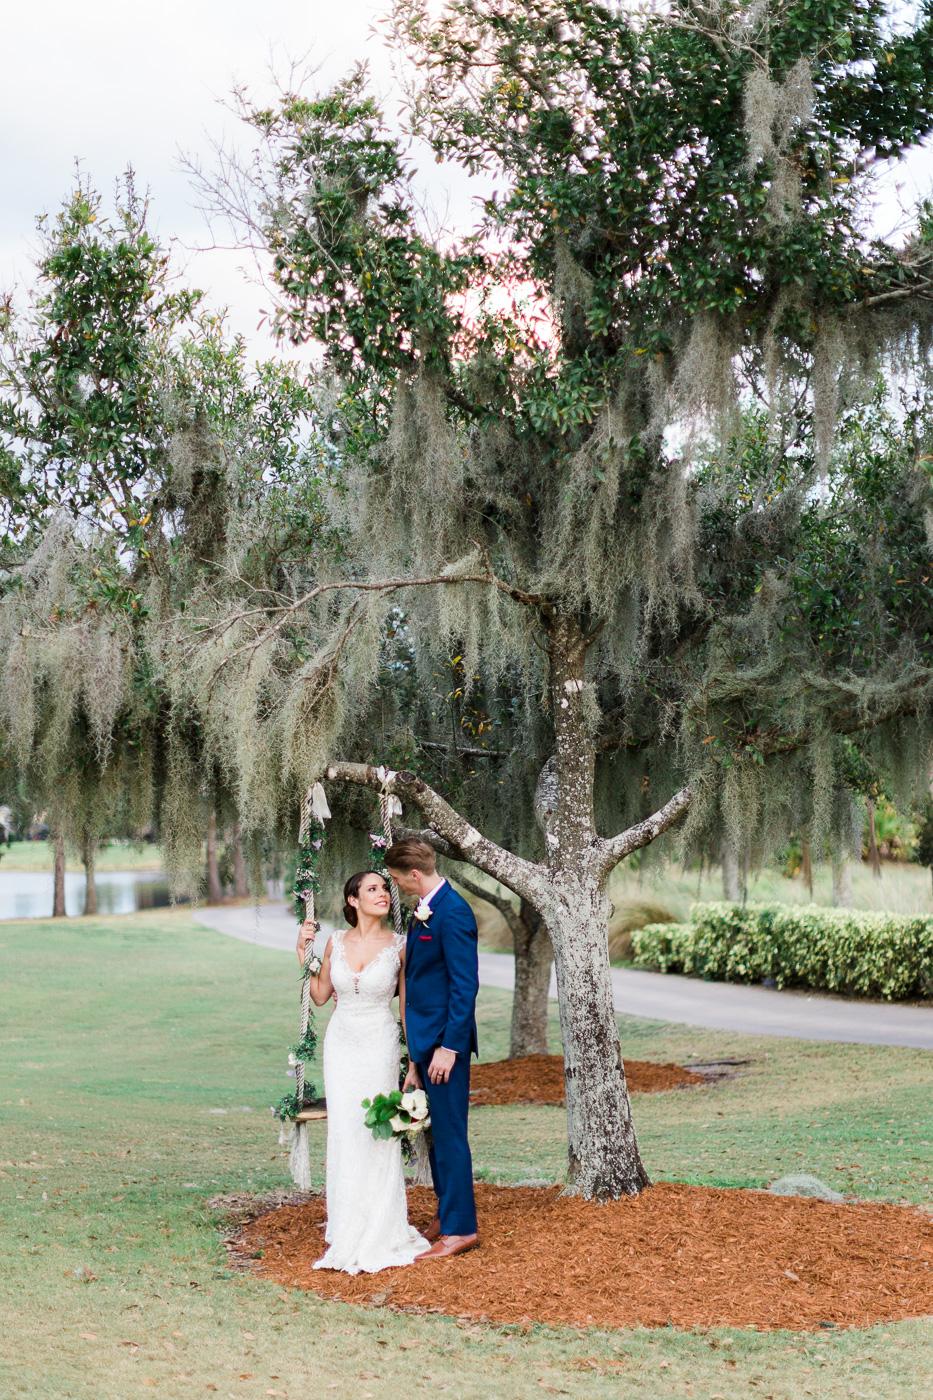 wedding at eagle creek orlando-6.jpg